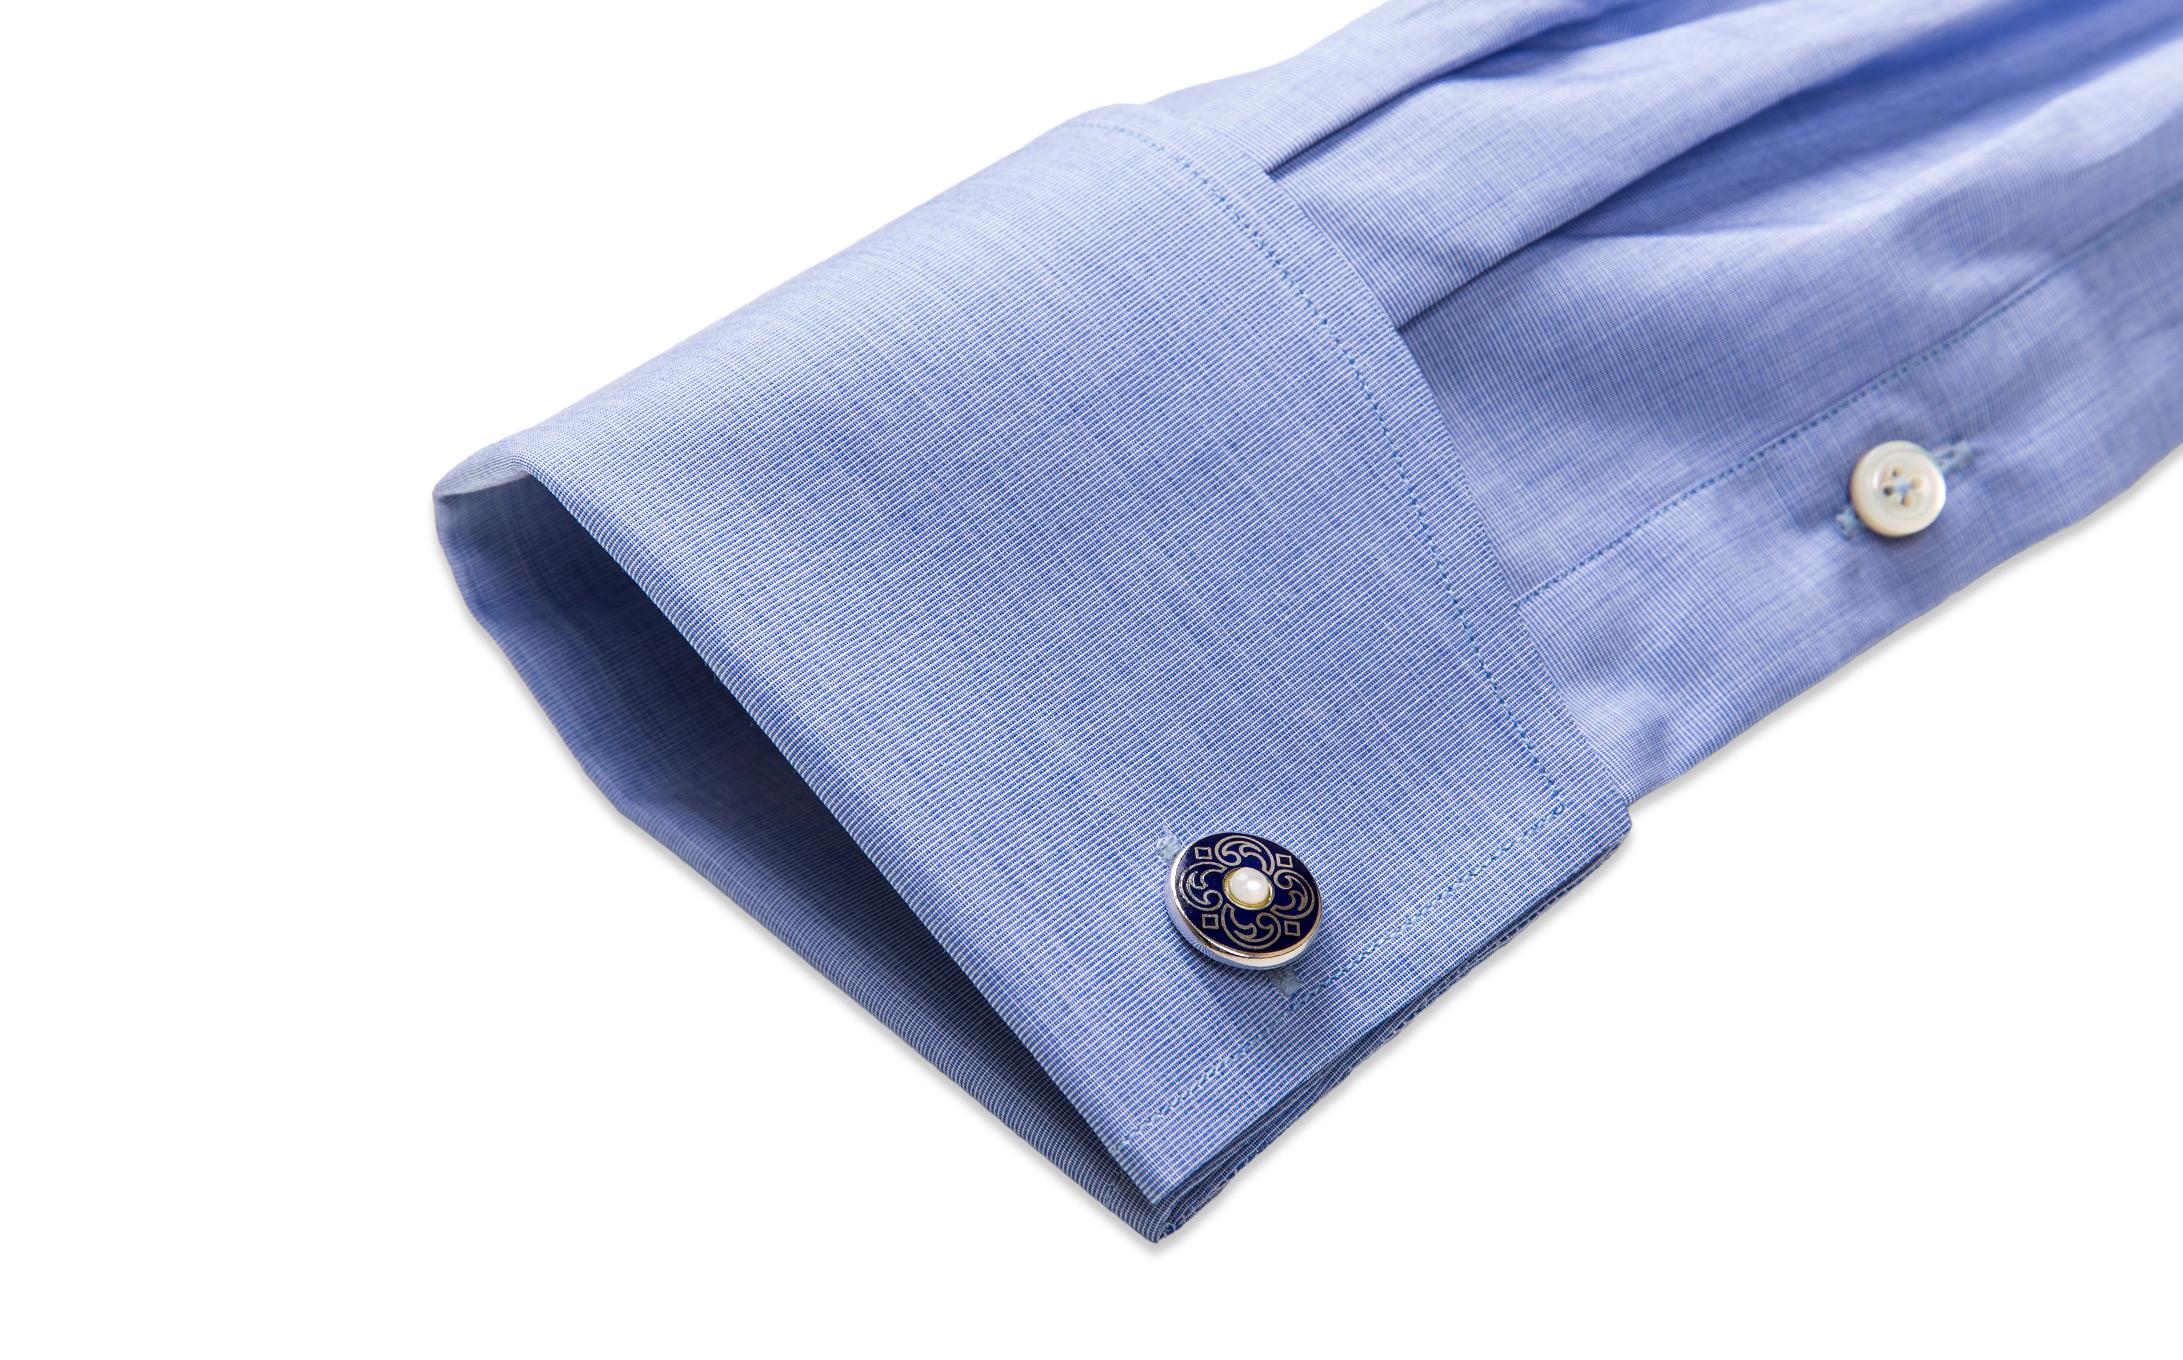 French Cuff Contoured shirt